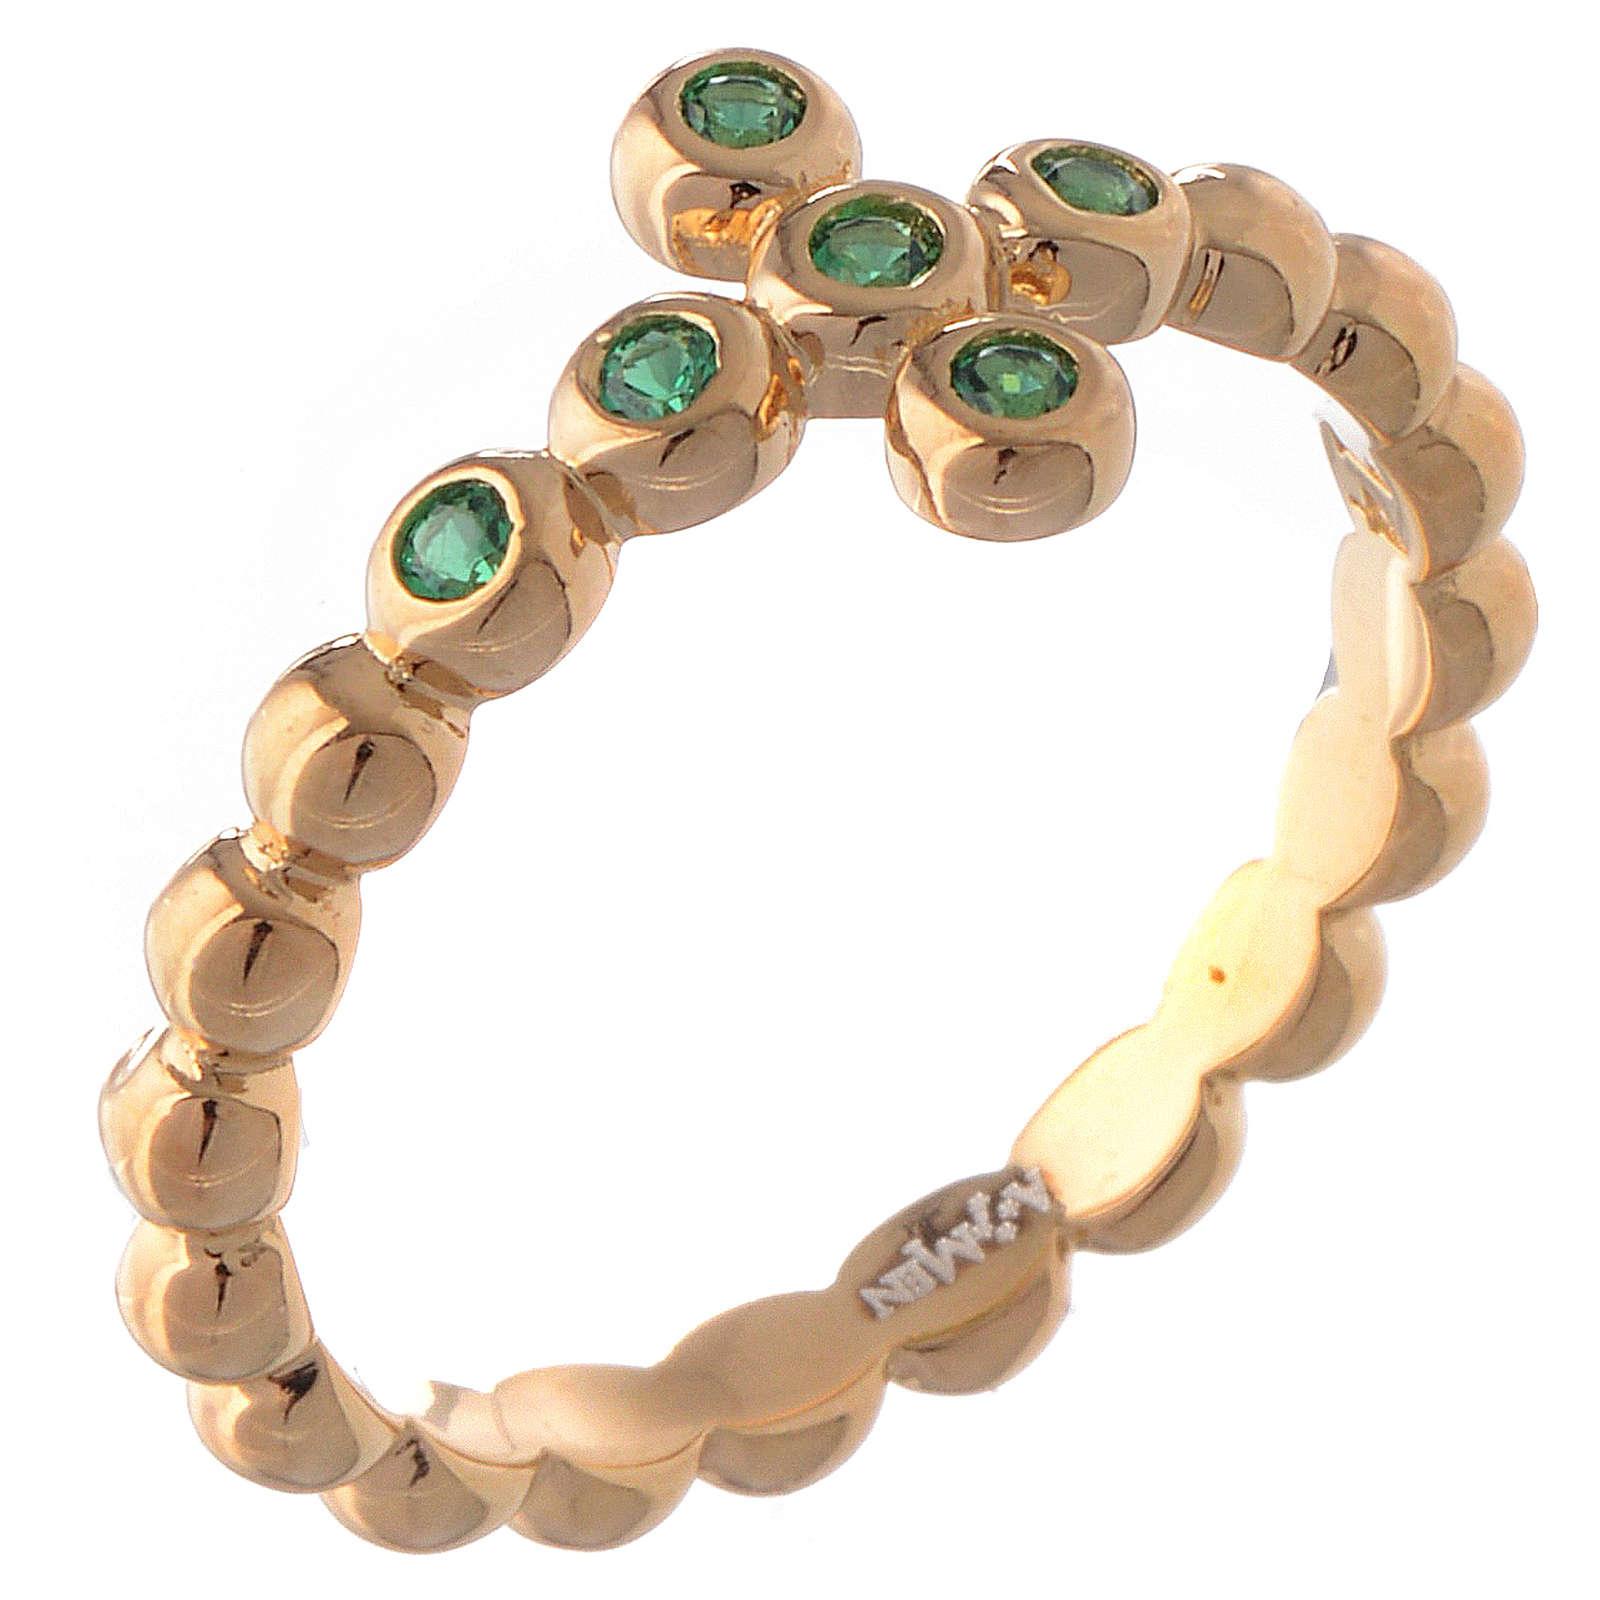 Anello AMEN Boules arg 925 dorato zirconi verdi 3